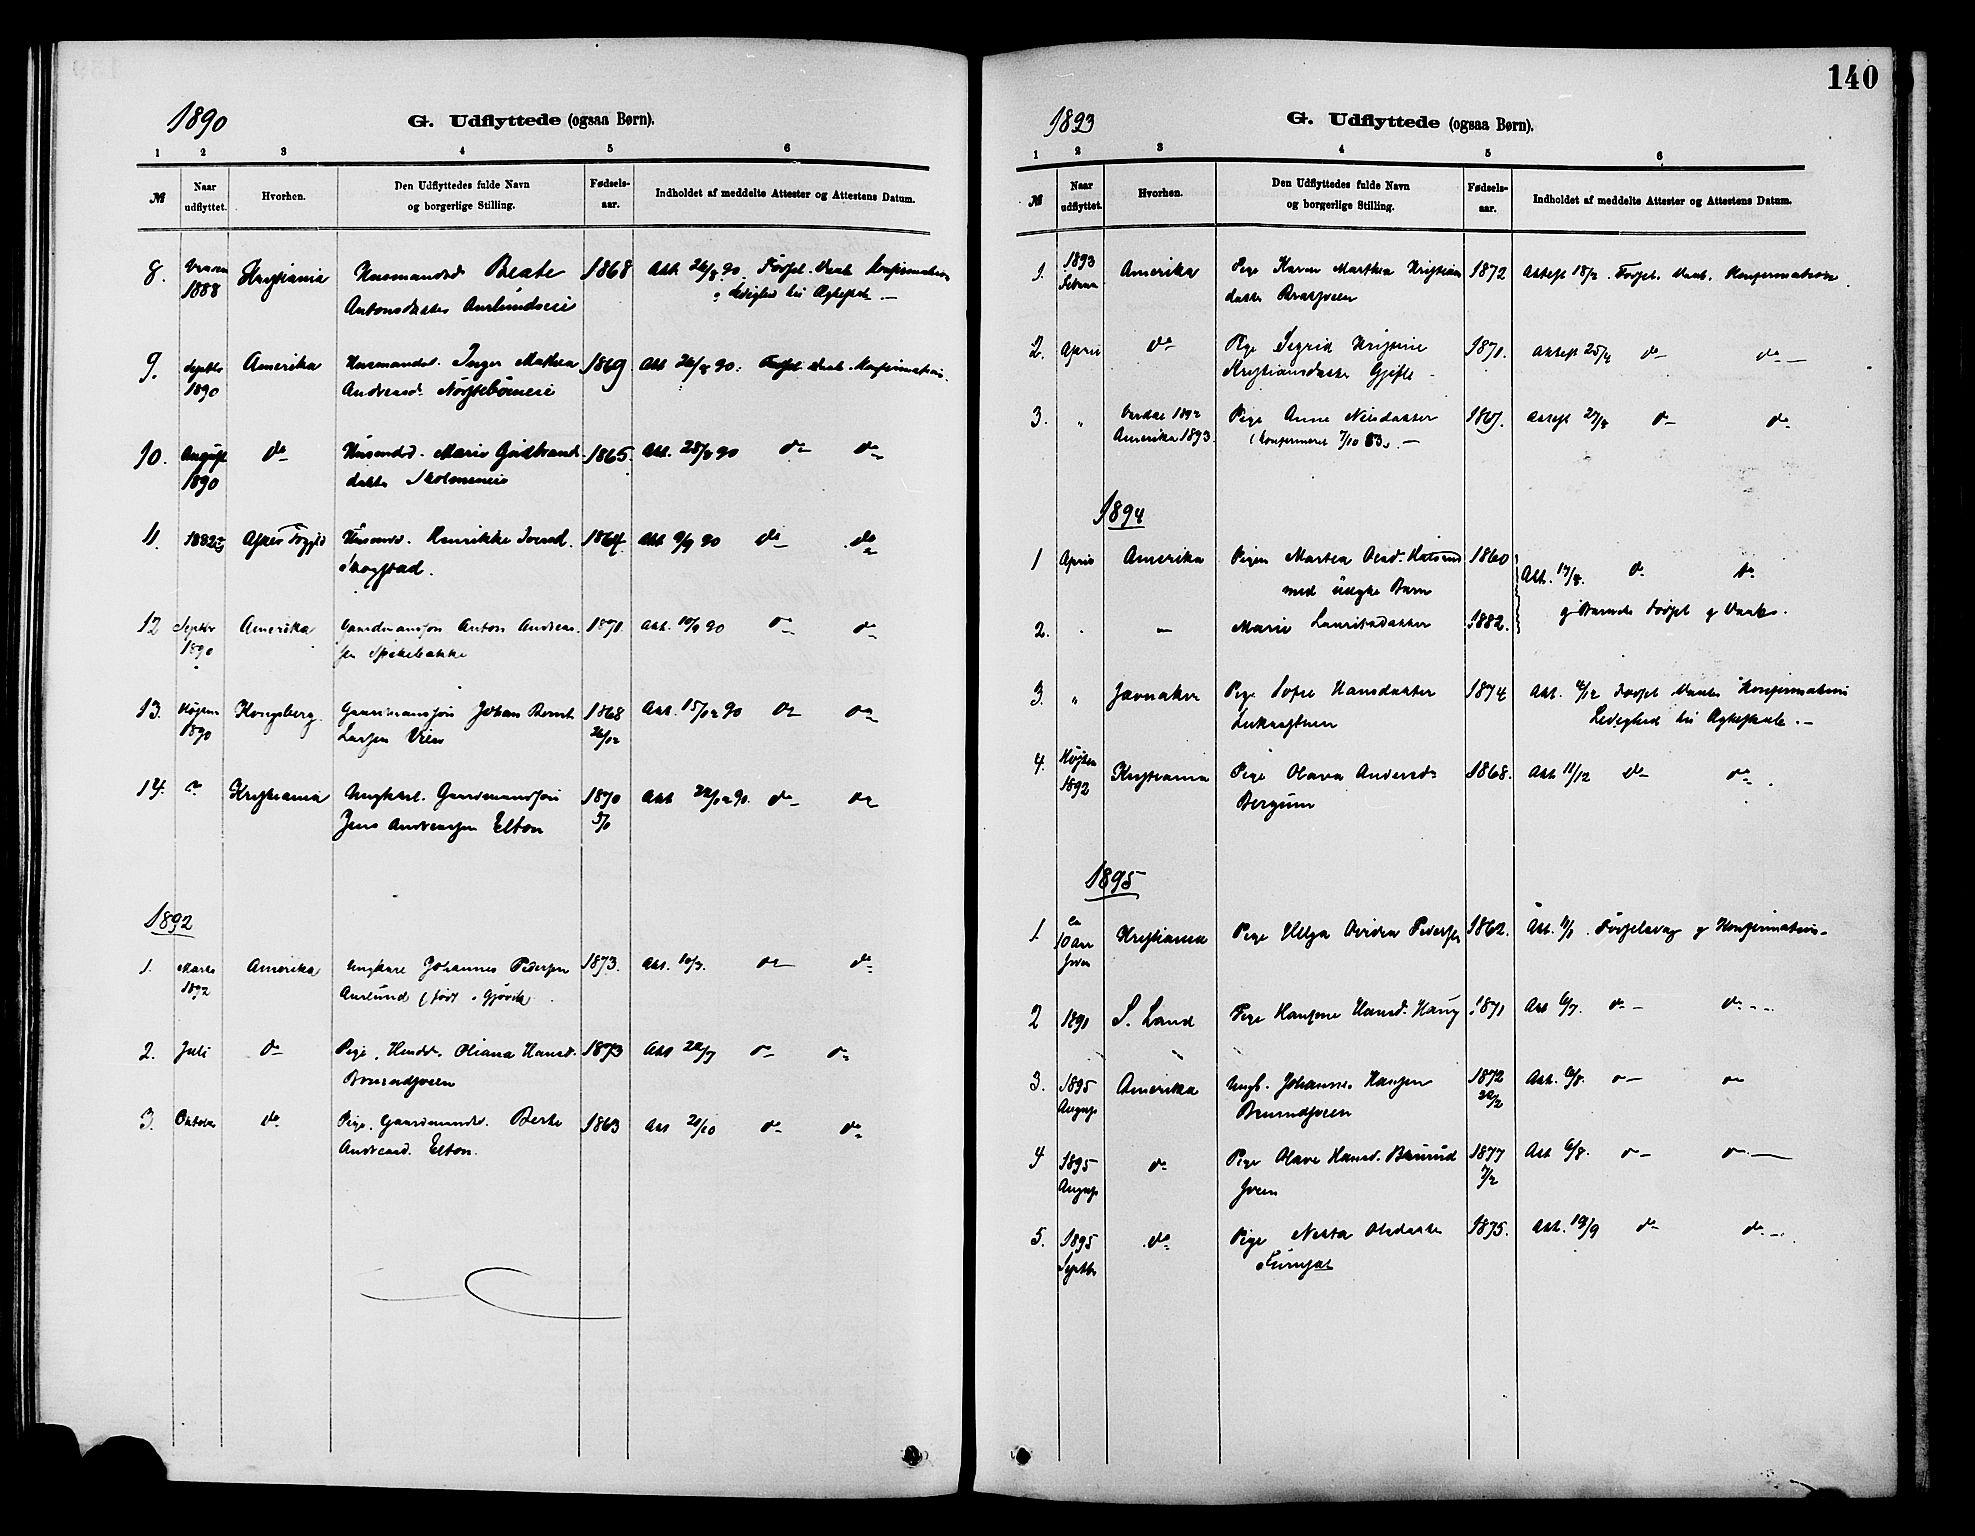 SAH, Nordre Land prestekontor, Ministerialbok nr. 3, 1882-1896, s. 140